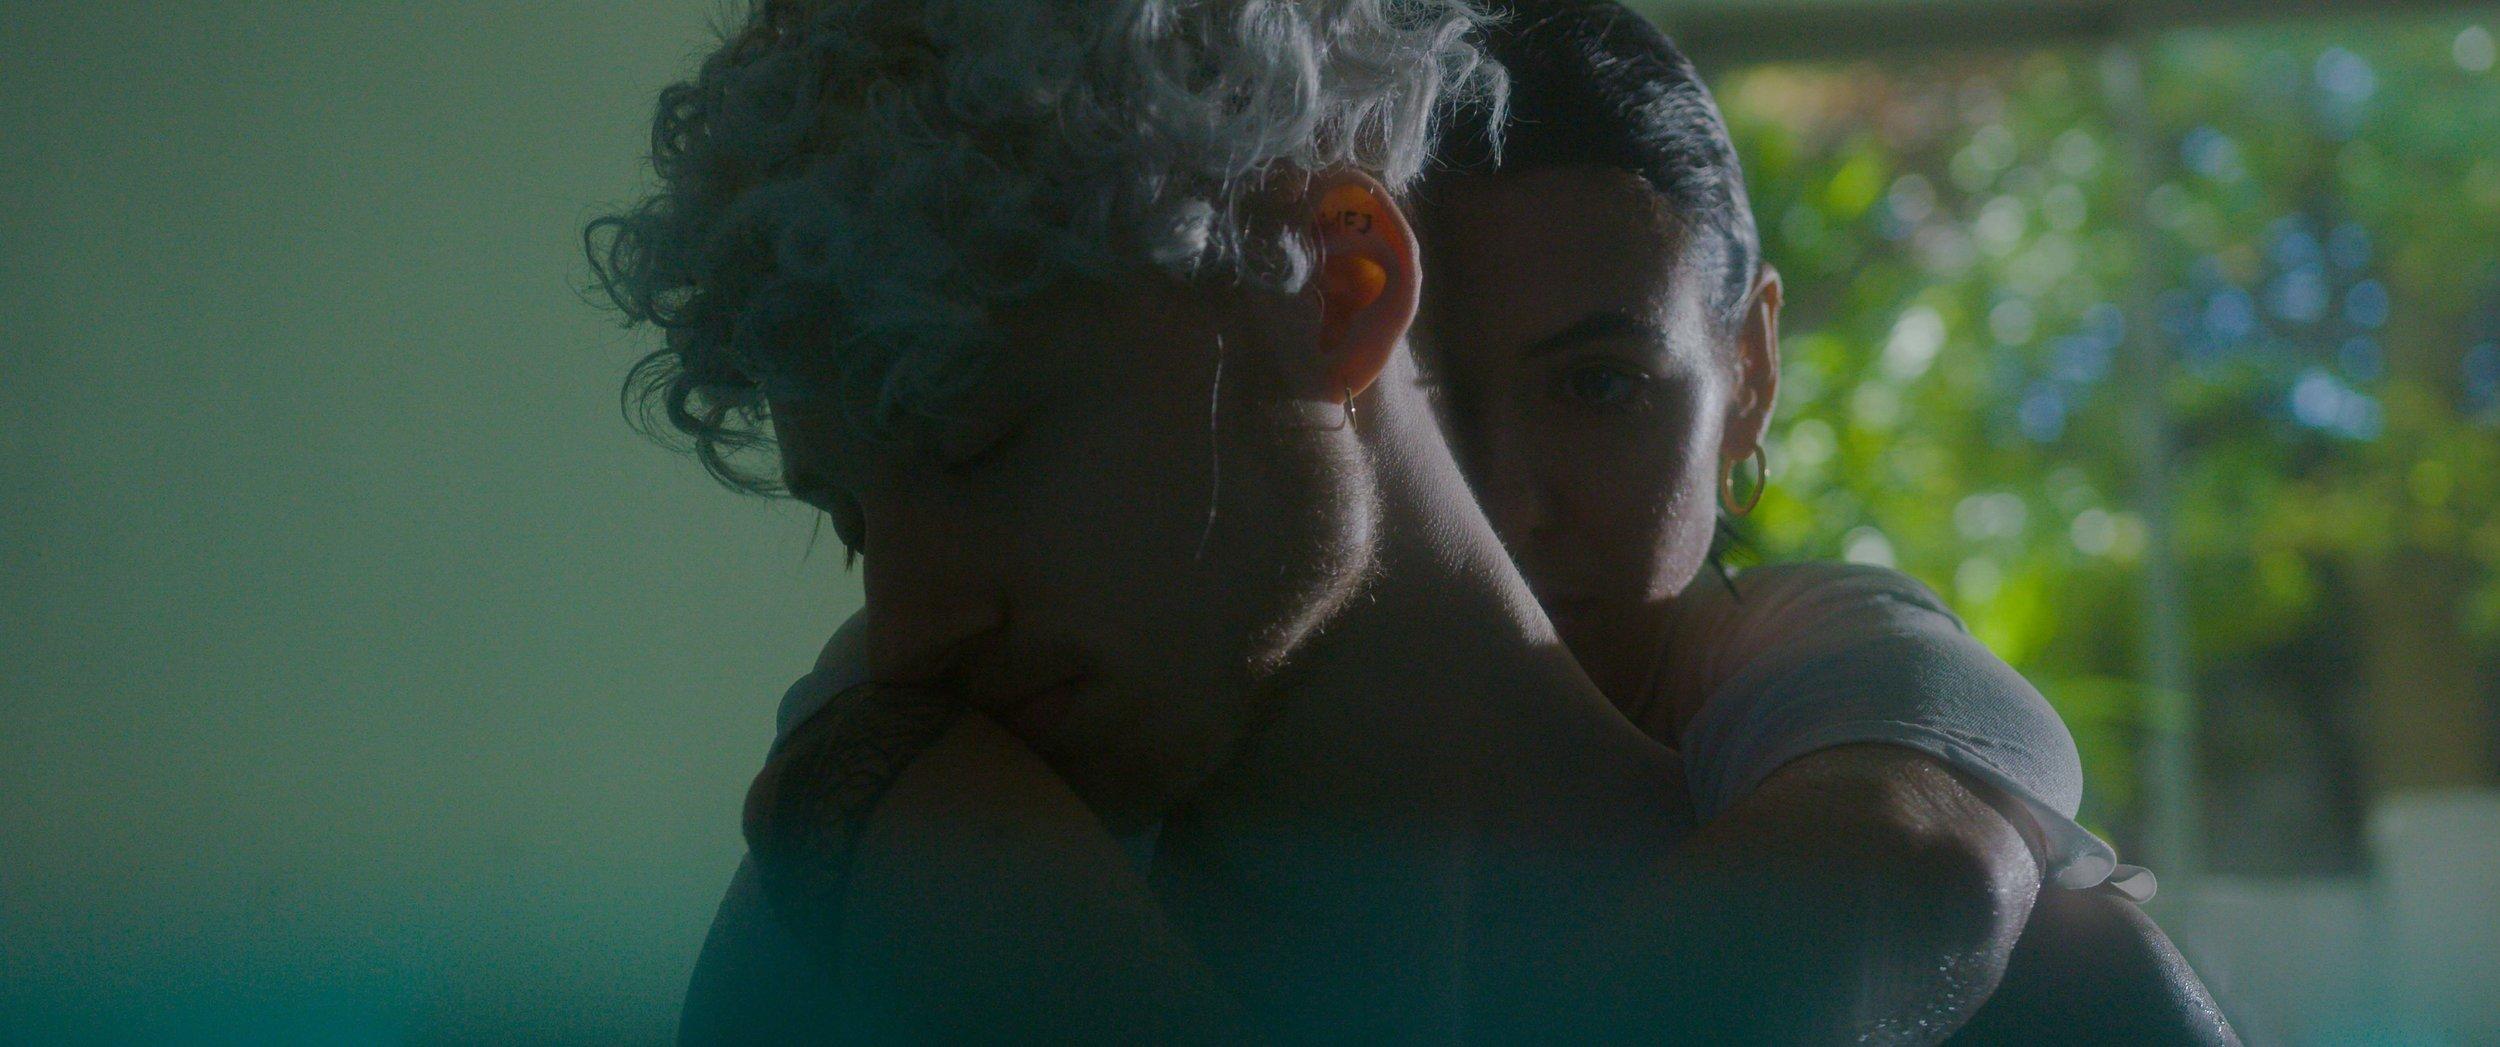 Music Video 043.jpg